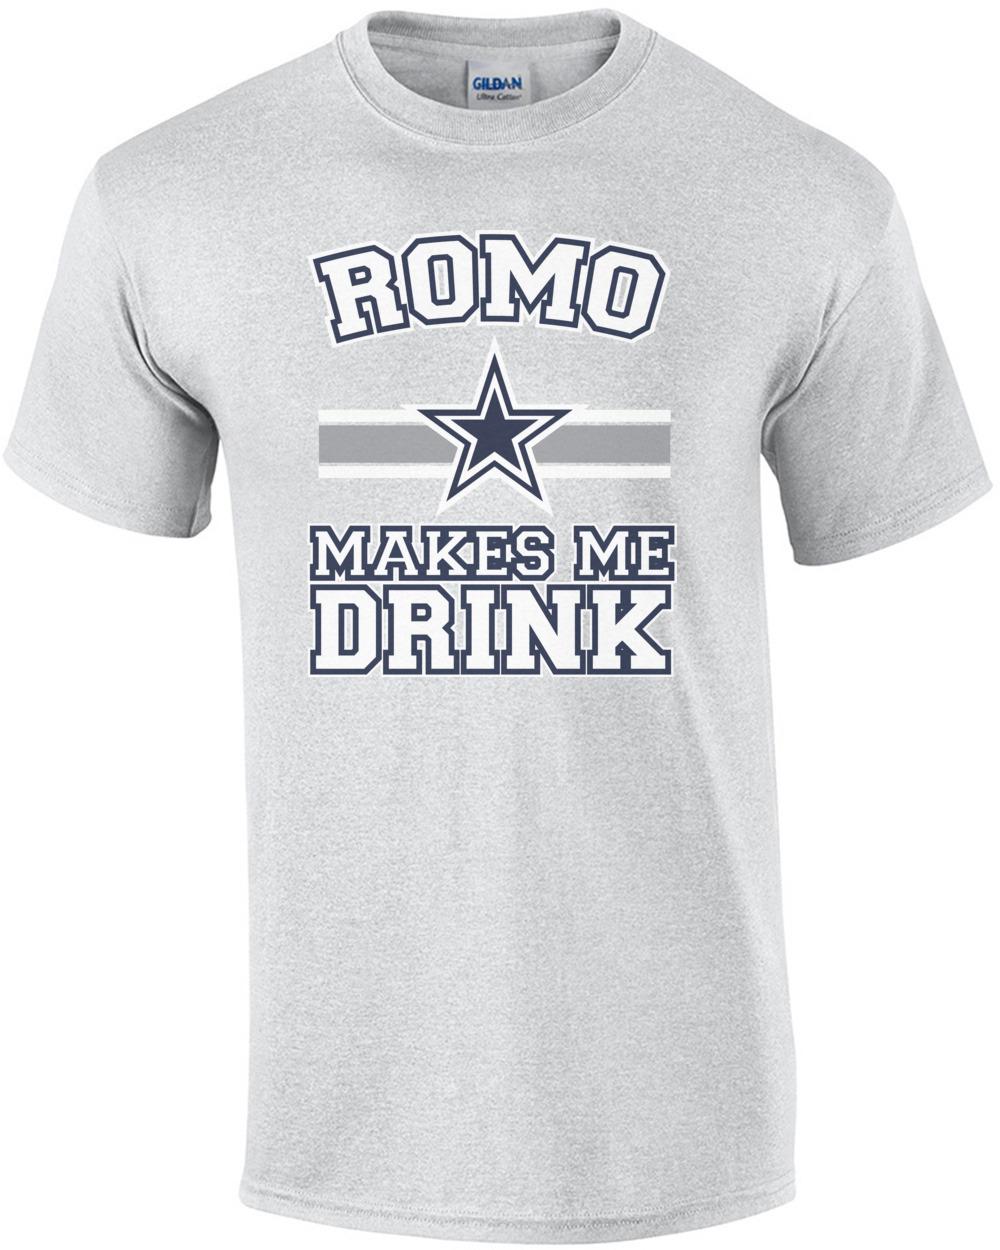 Romo Makes Me Drink - Dallas Cowboys T-Shirt shirt 33941e95a